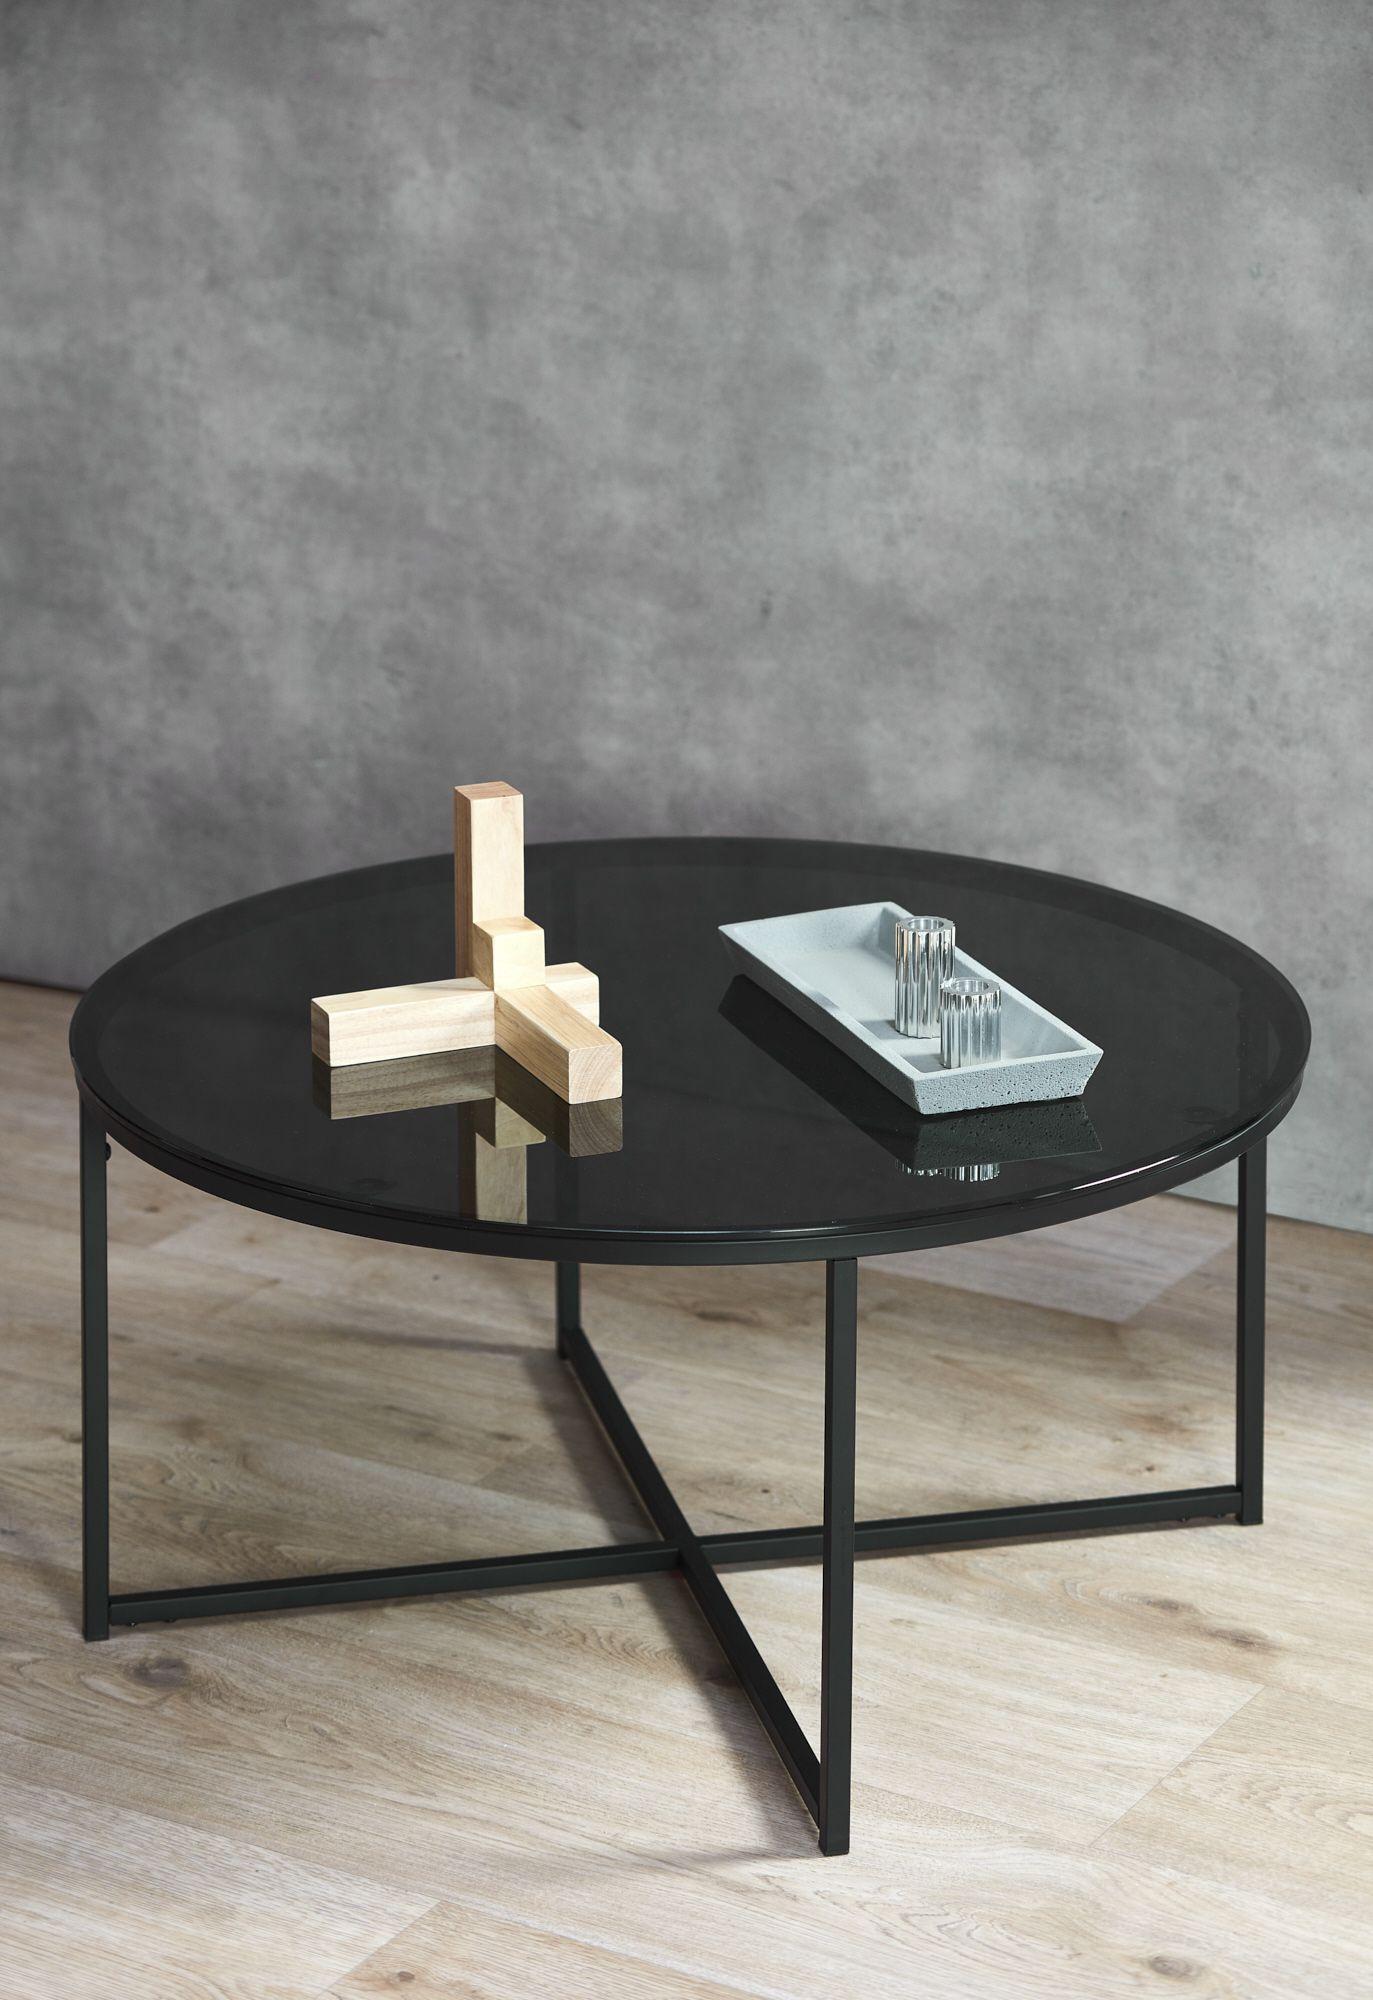 Smoked Siena Round Glass Coffee Table Round Glass Coffee Table Glass Coffee Table Coffee Table [ 2000 x 1373 Pixel ]